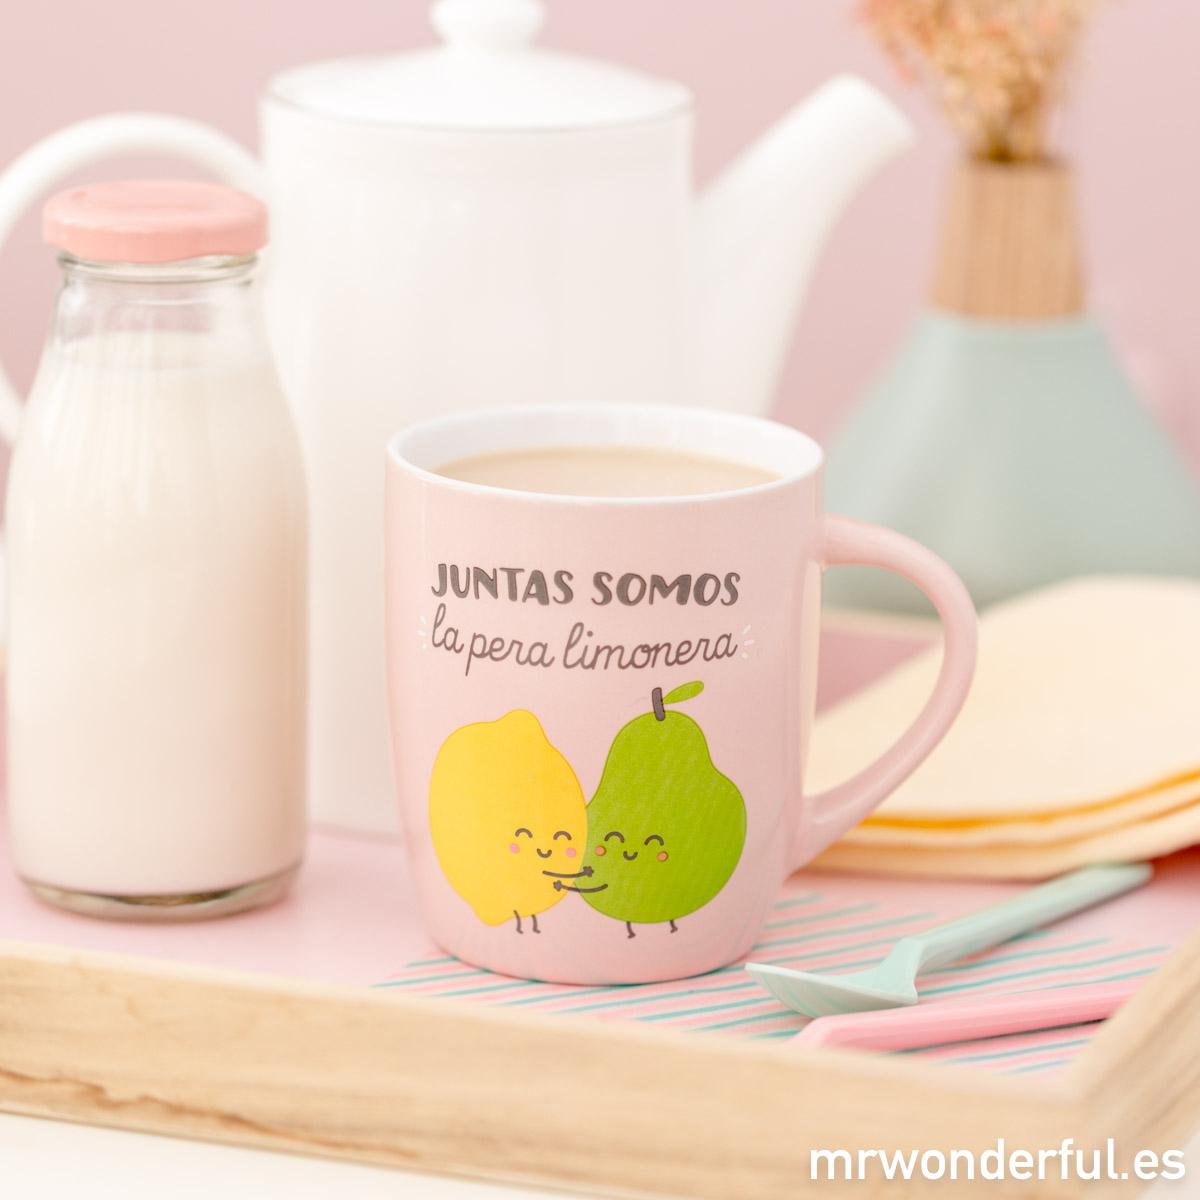 mrwonderful_8435460709361_WOA03782ES_Juntas-somos-la-pera-limonera-ES-1-2